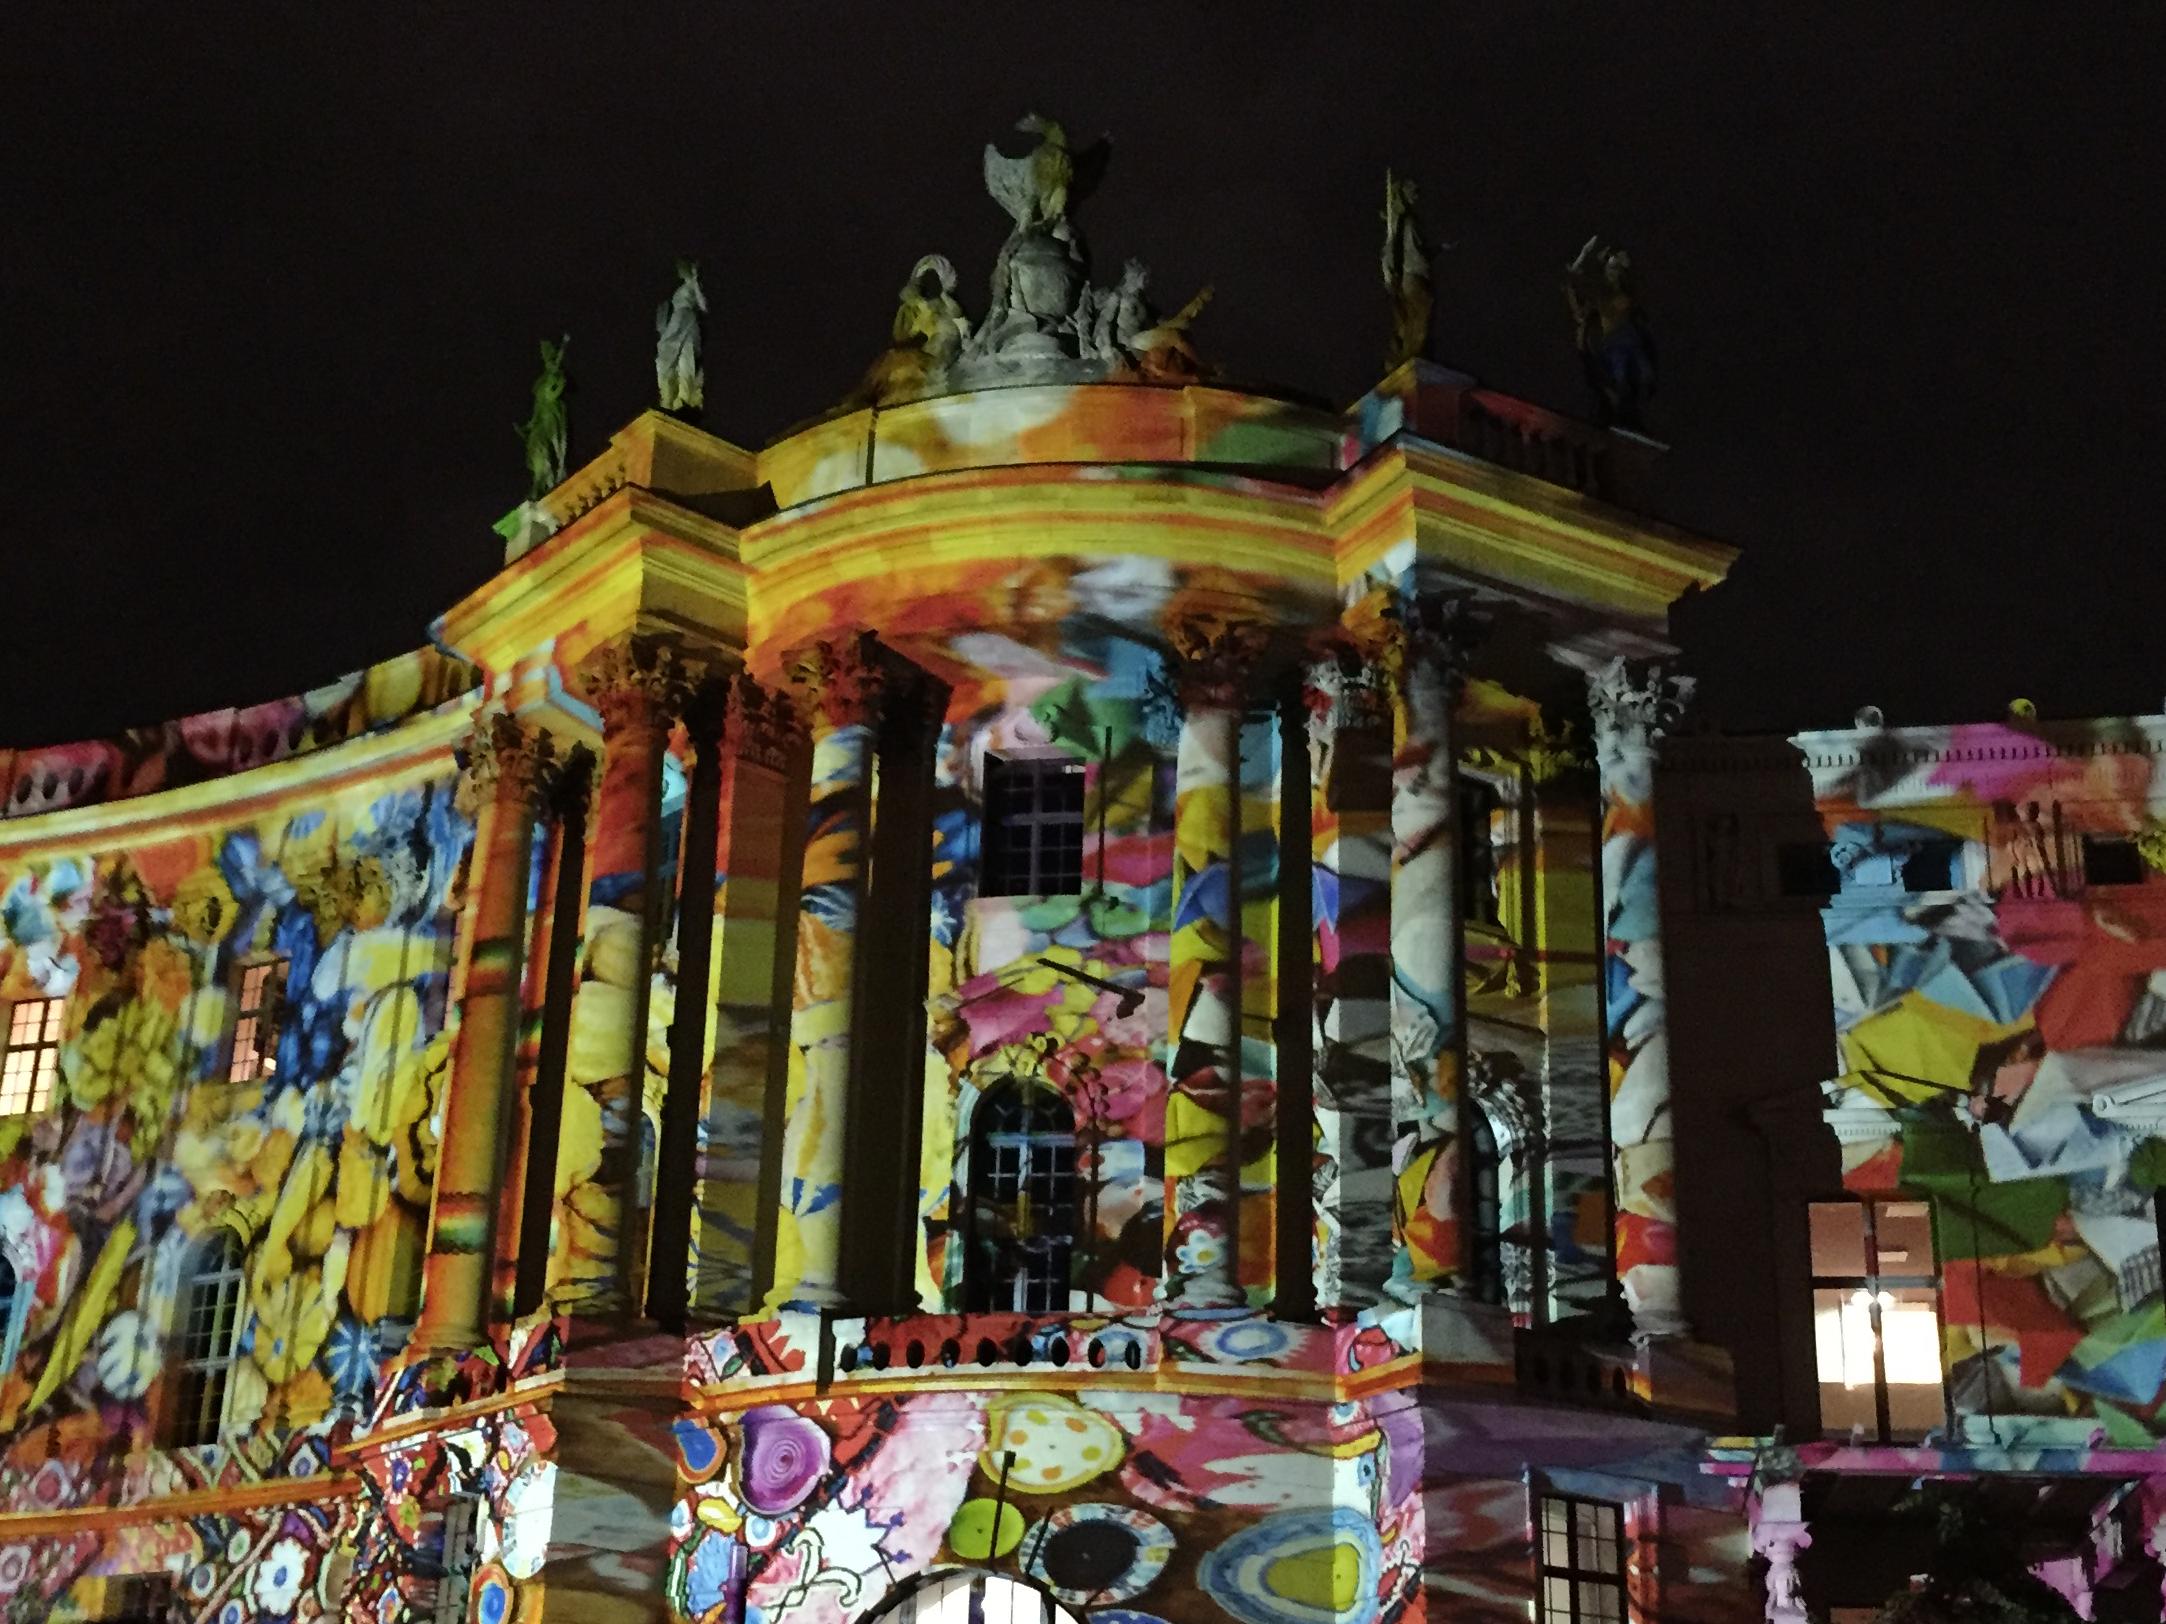 Juristische Fakultät der Humbolt-Universität-Festival of Lights 2016